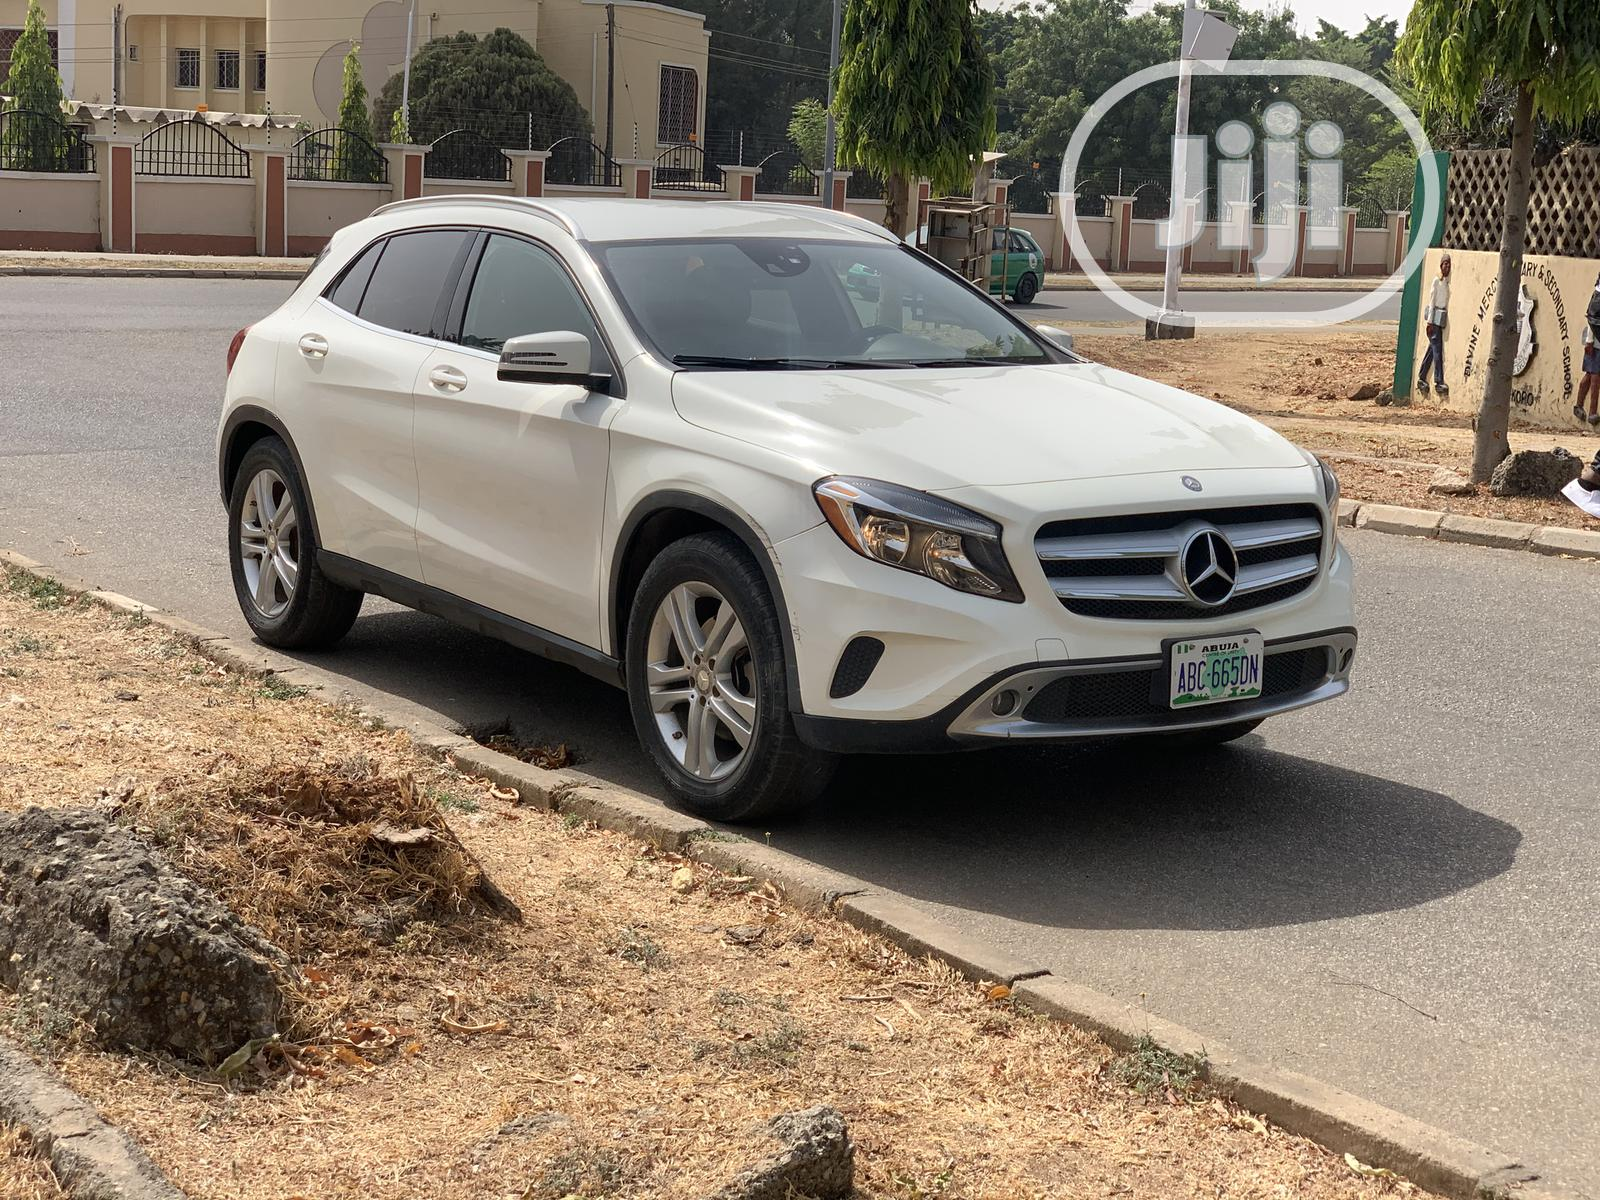 Archive: Mercedes-Benz GLA-Class 2014 White